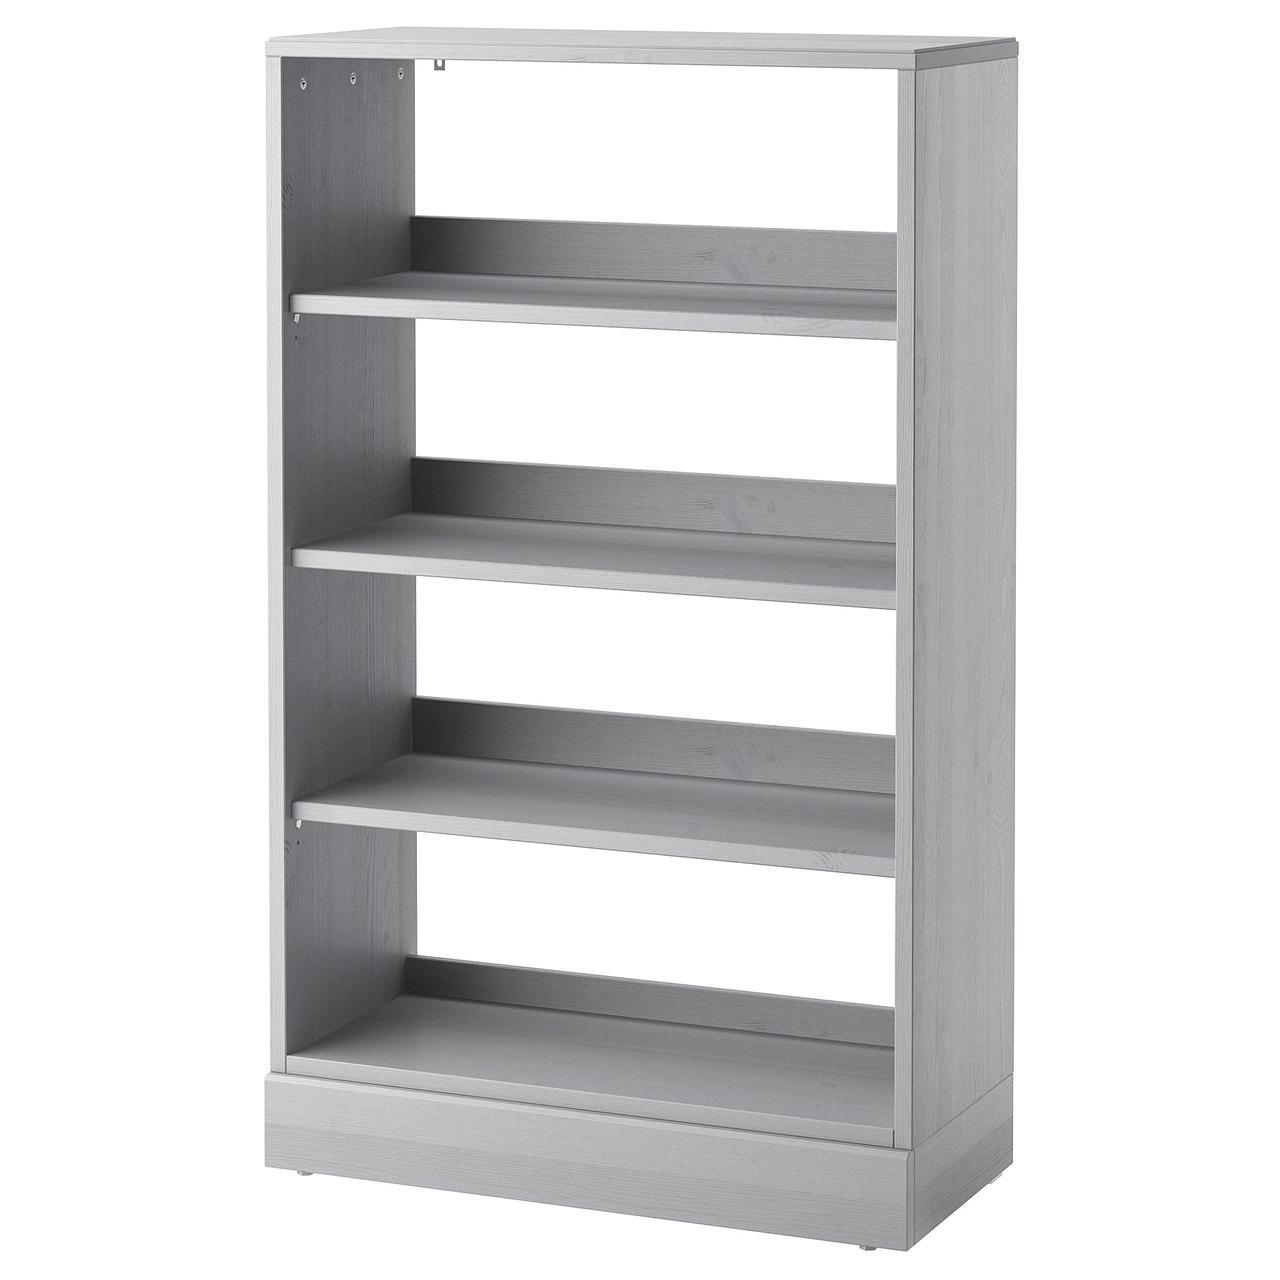 Стелаж IKEA HAVSTA 81x134x37 см сірий 492.750.88